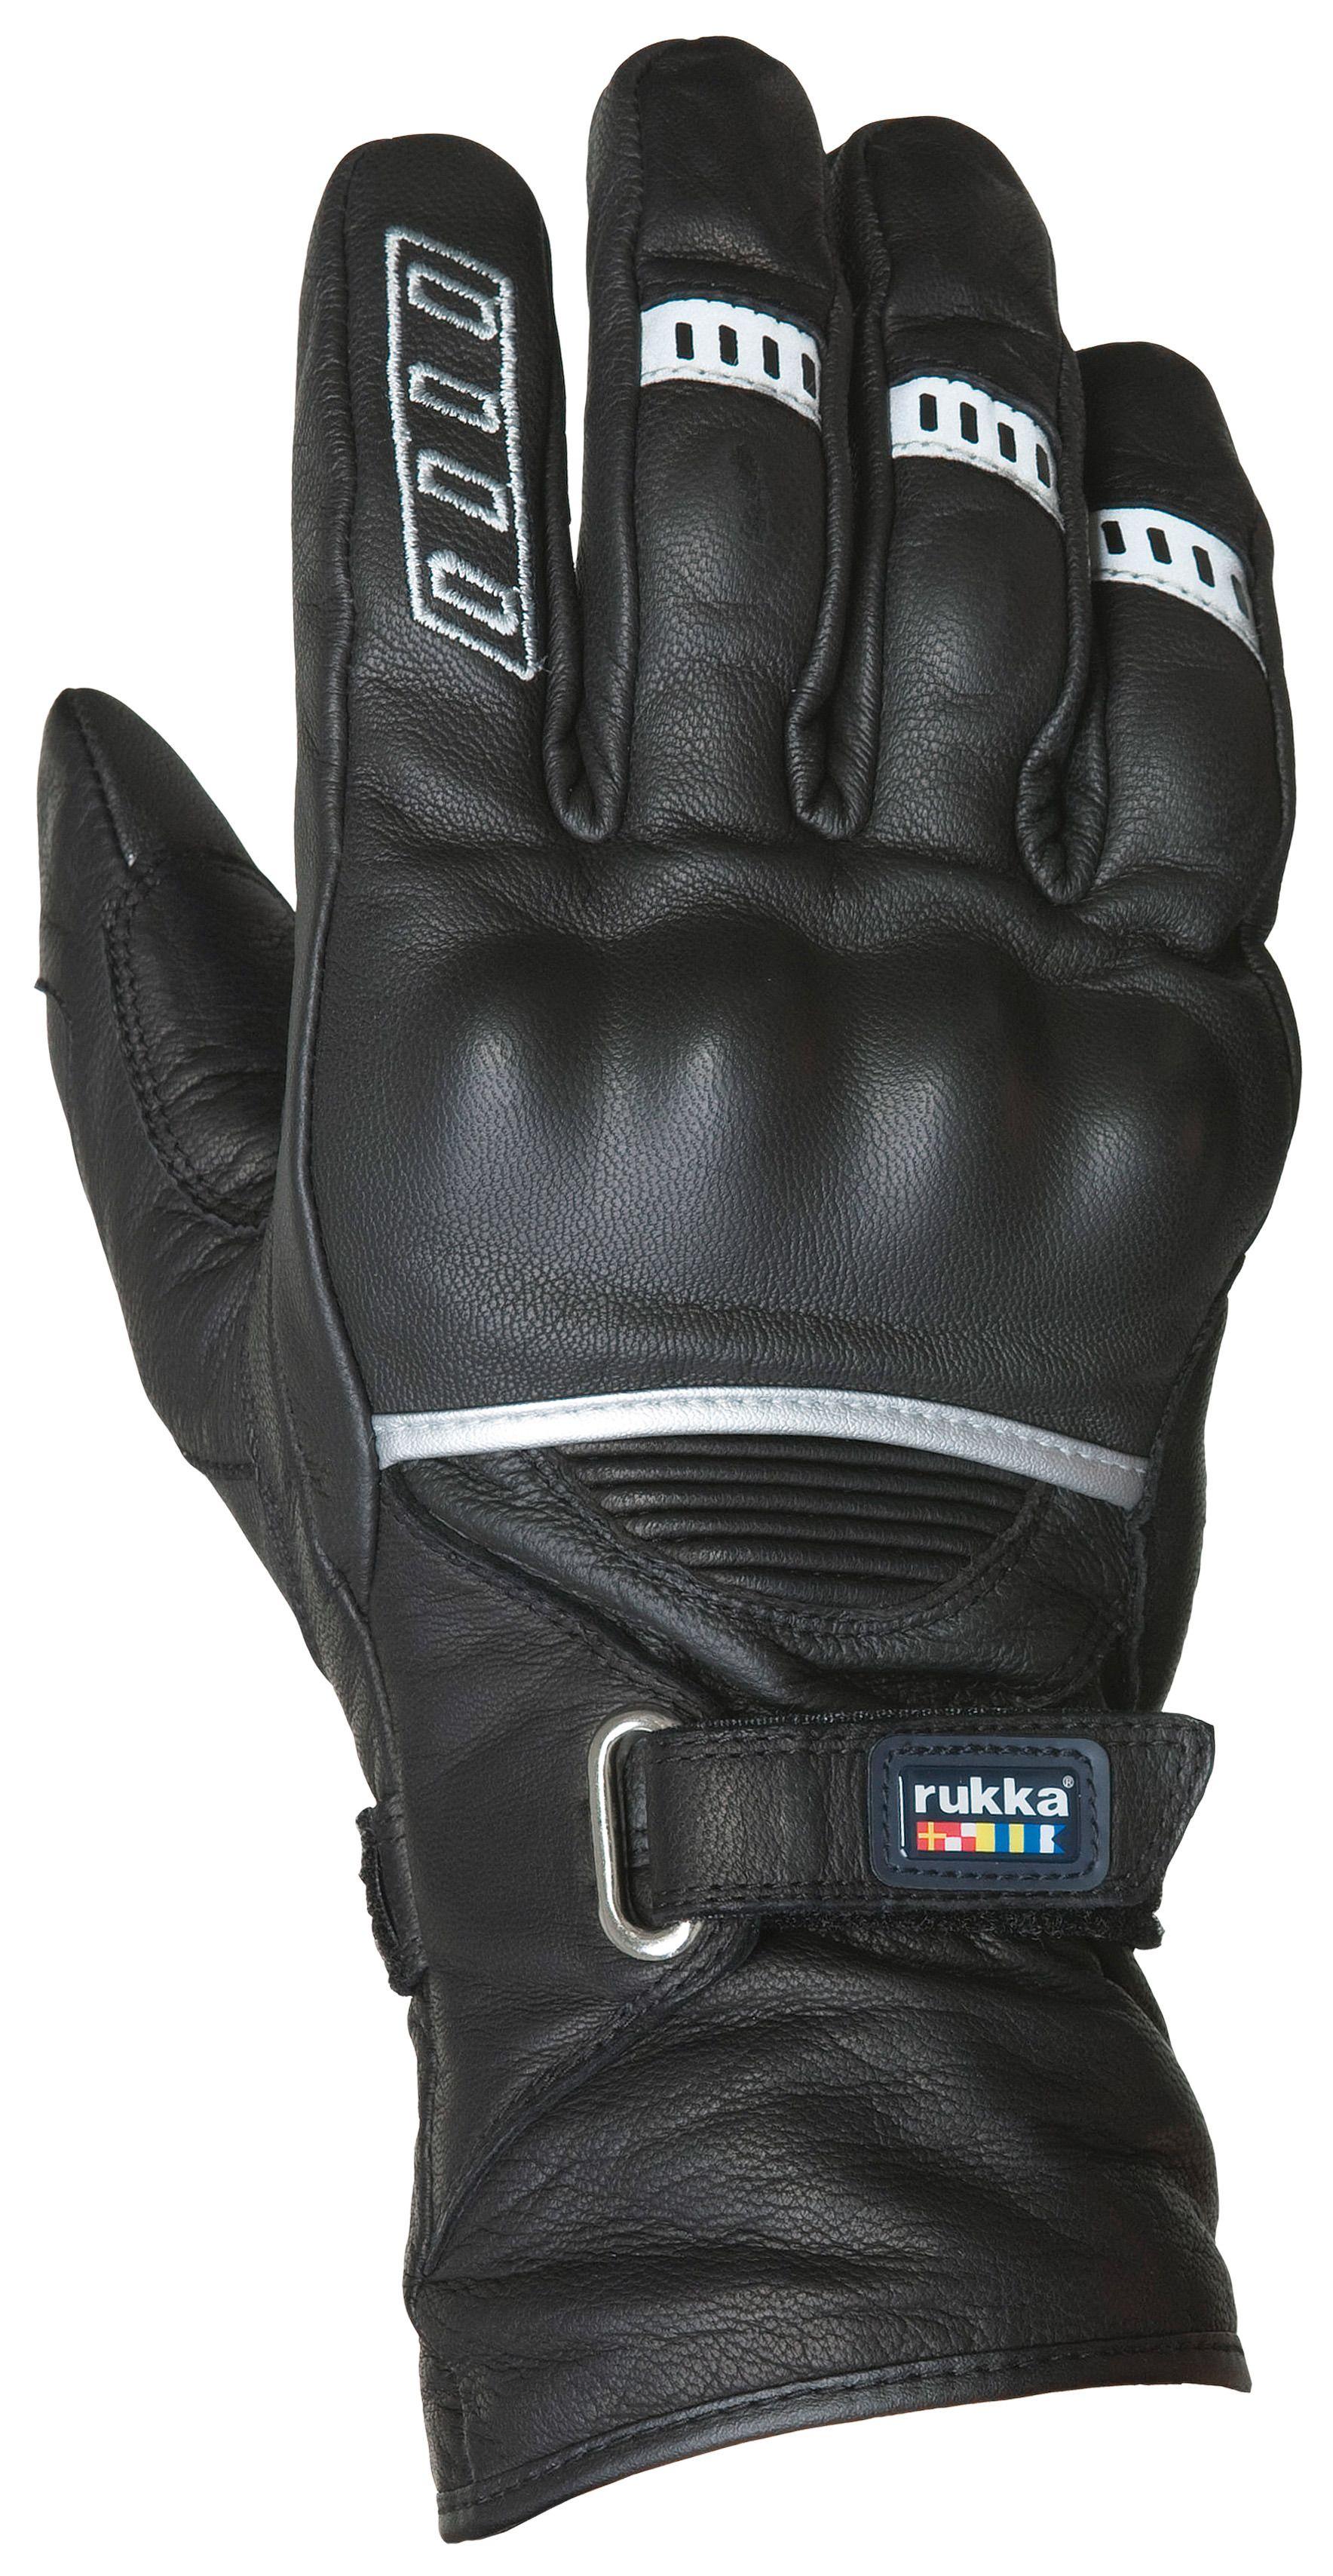 Rukka Apollo Gore Tex X Trafit Gloves Revzilla